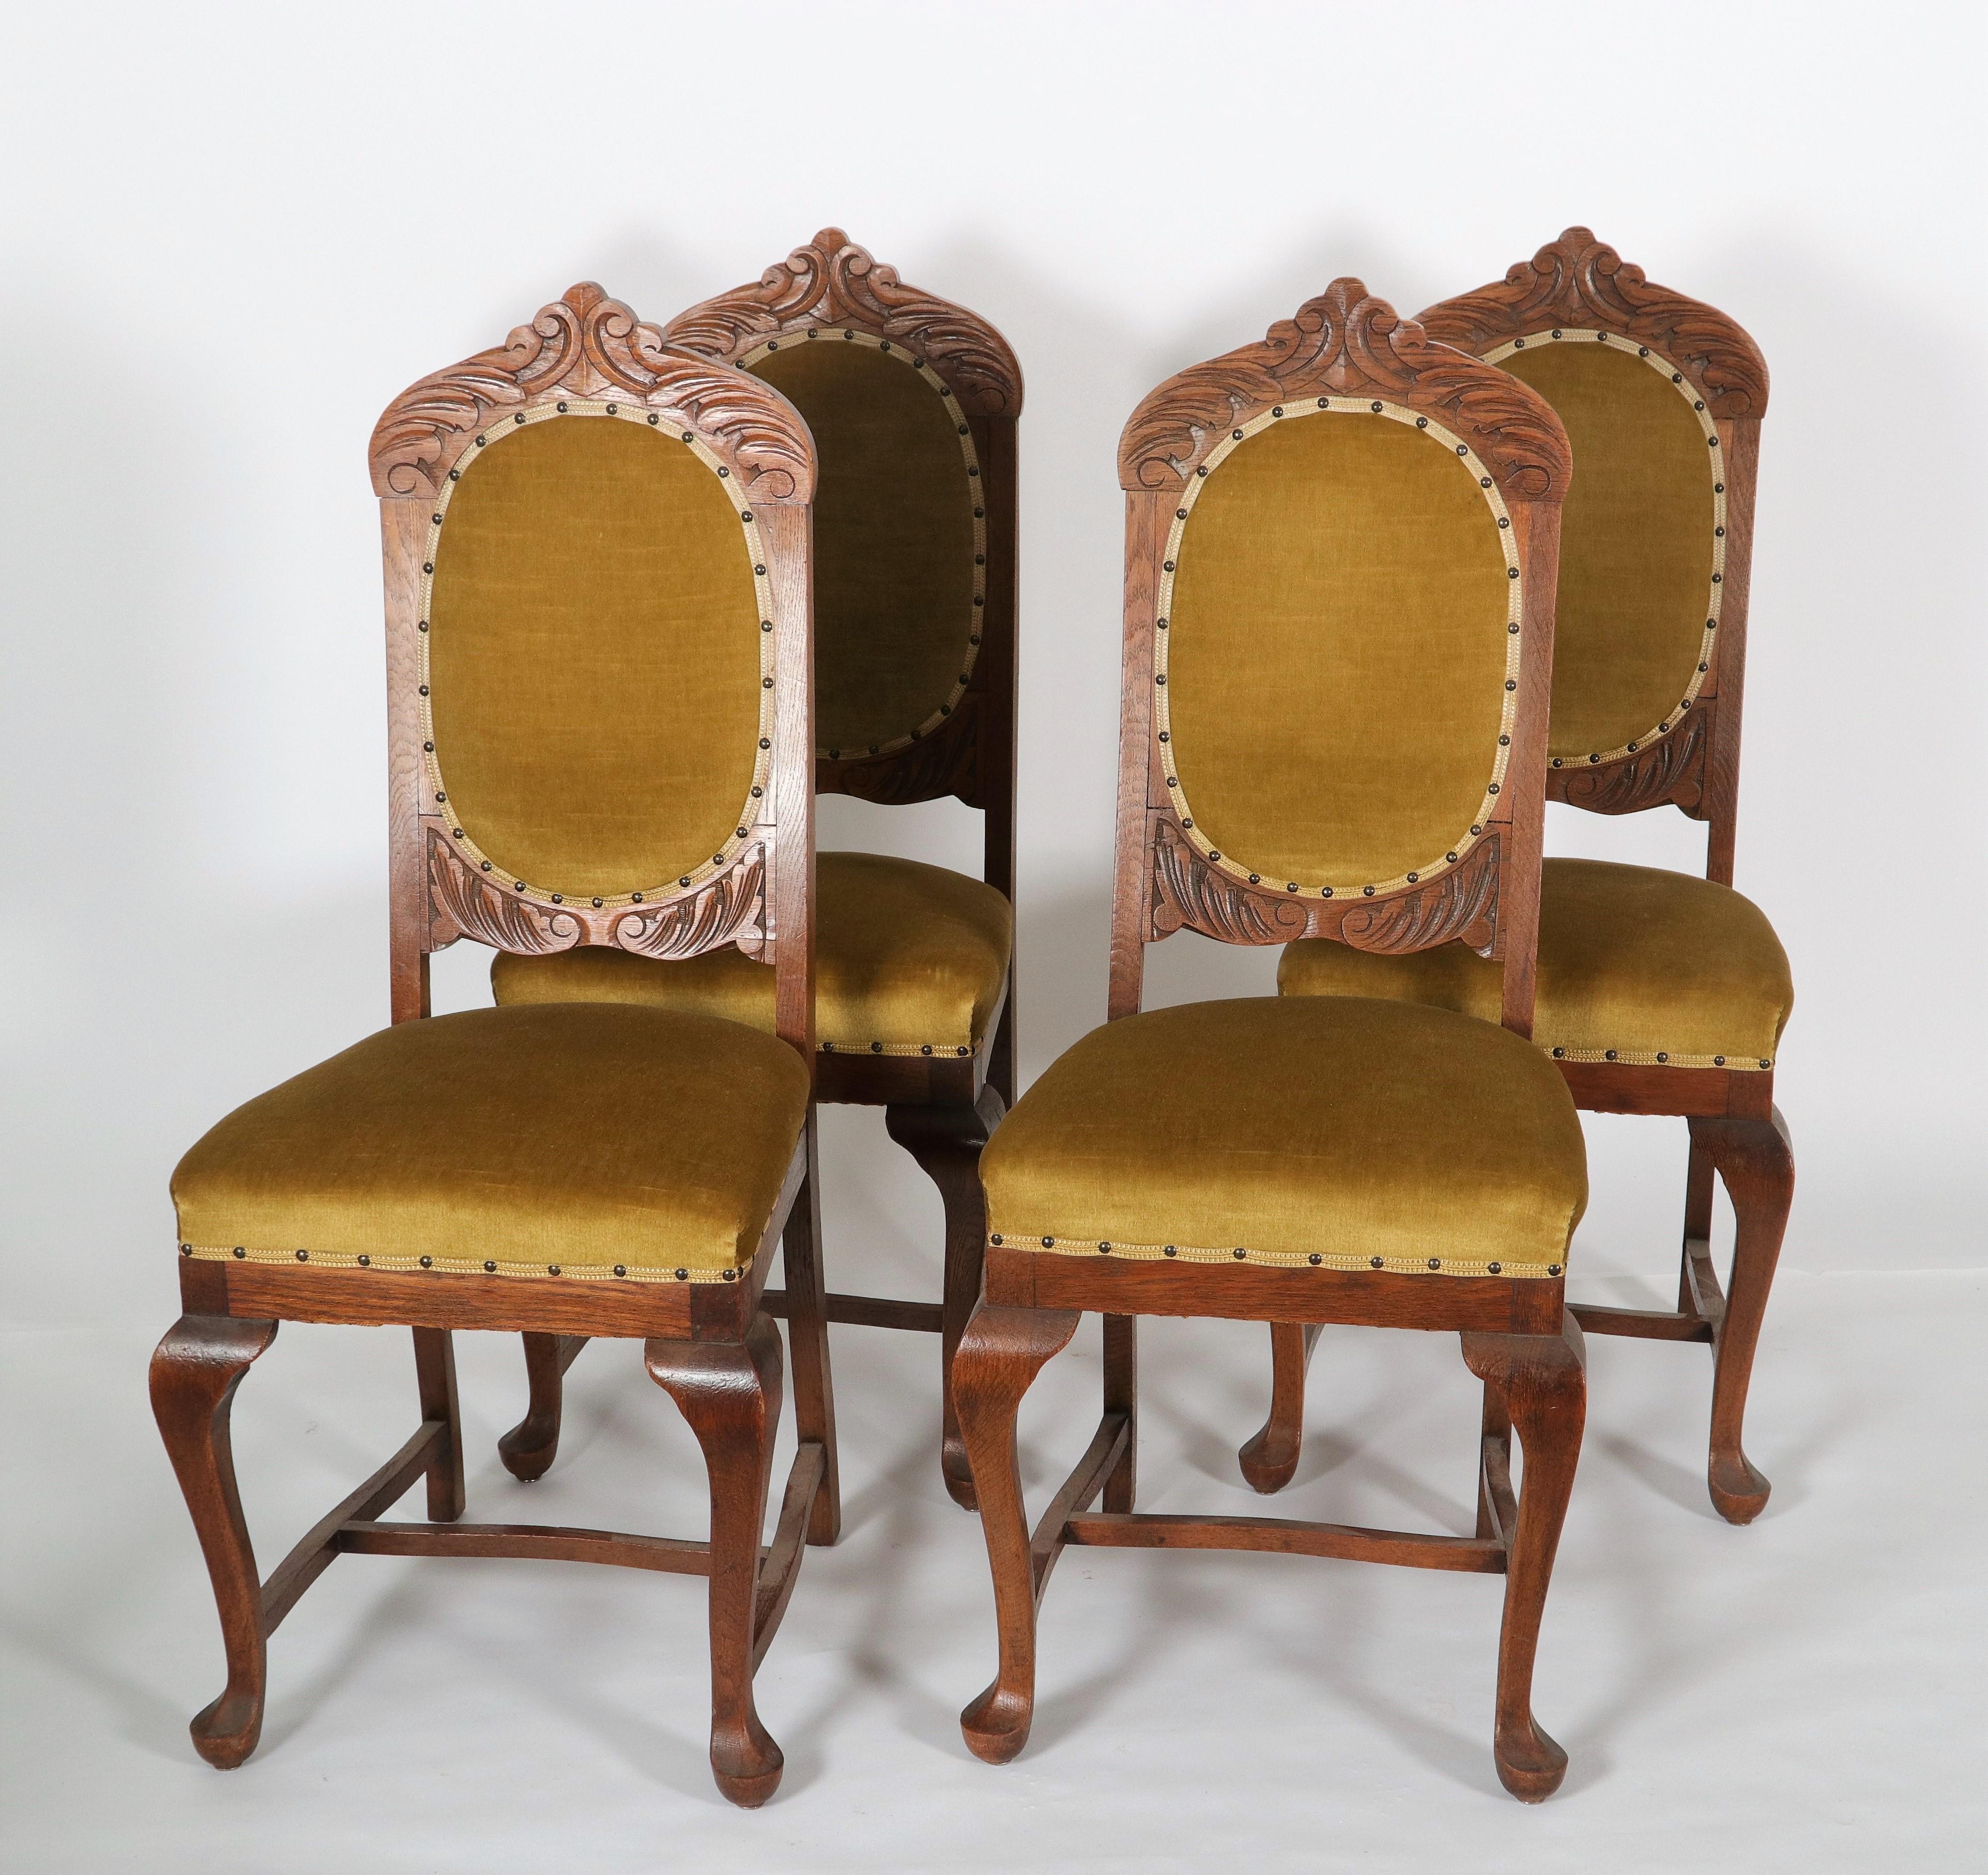 Four oak dining room chairs - Duveen